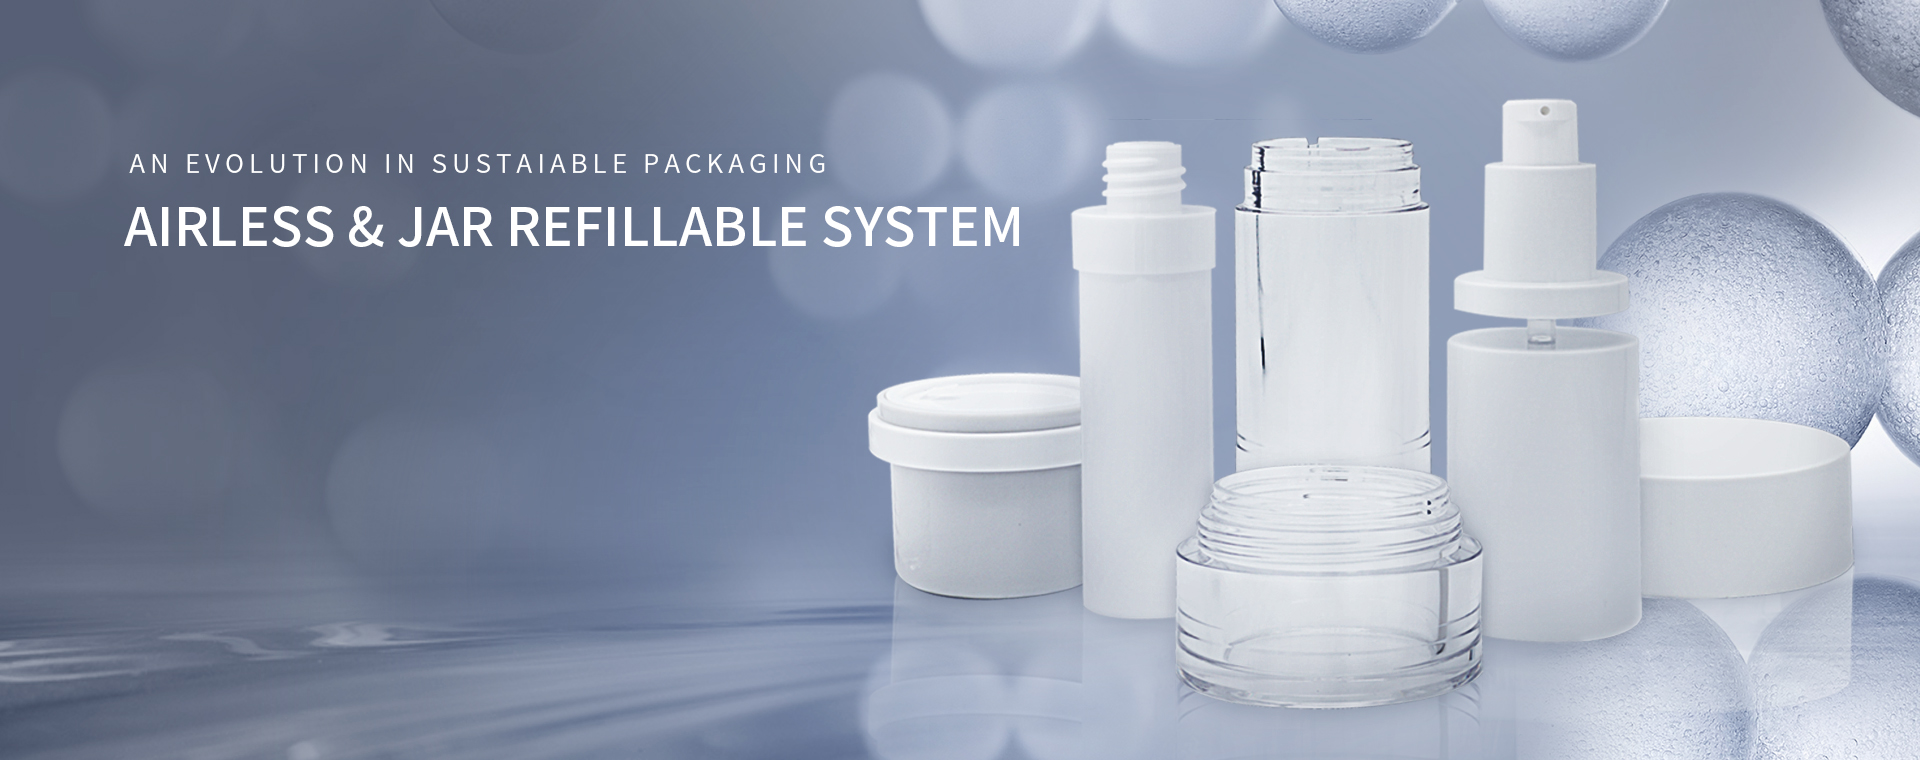 PCR Packaging